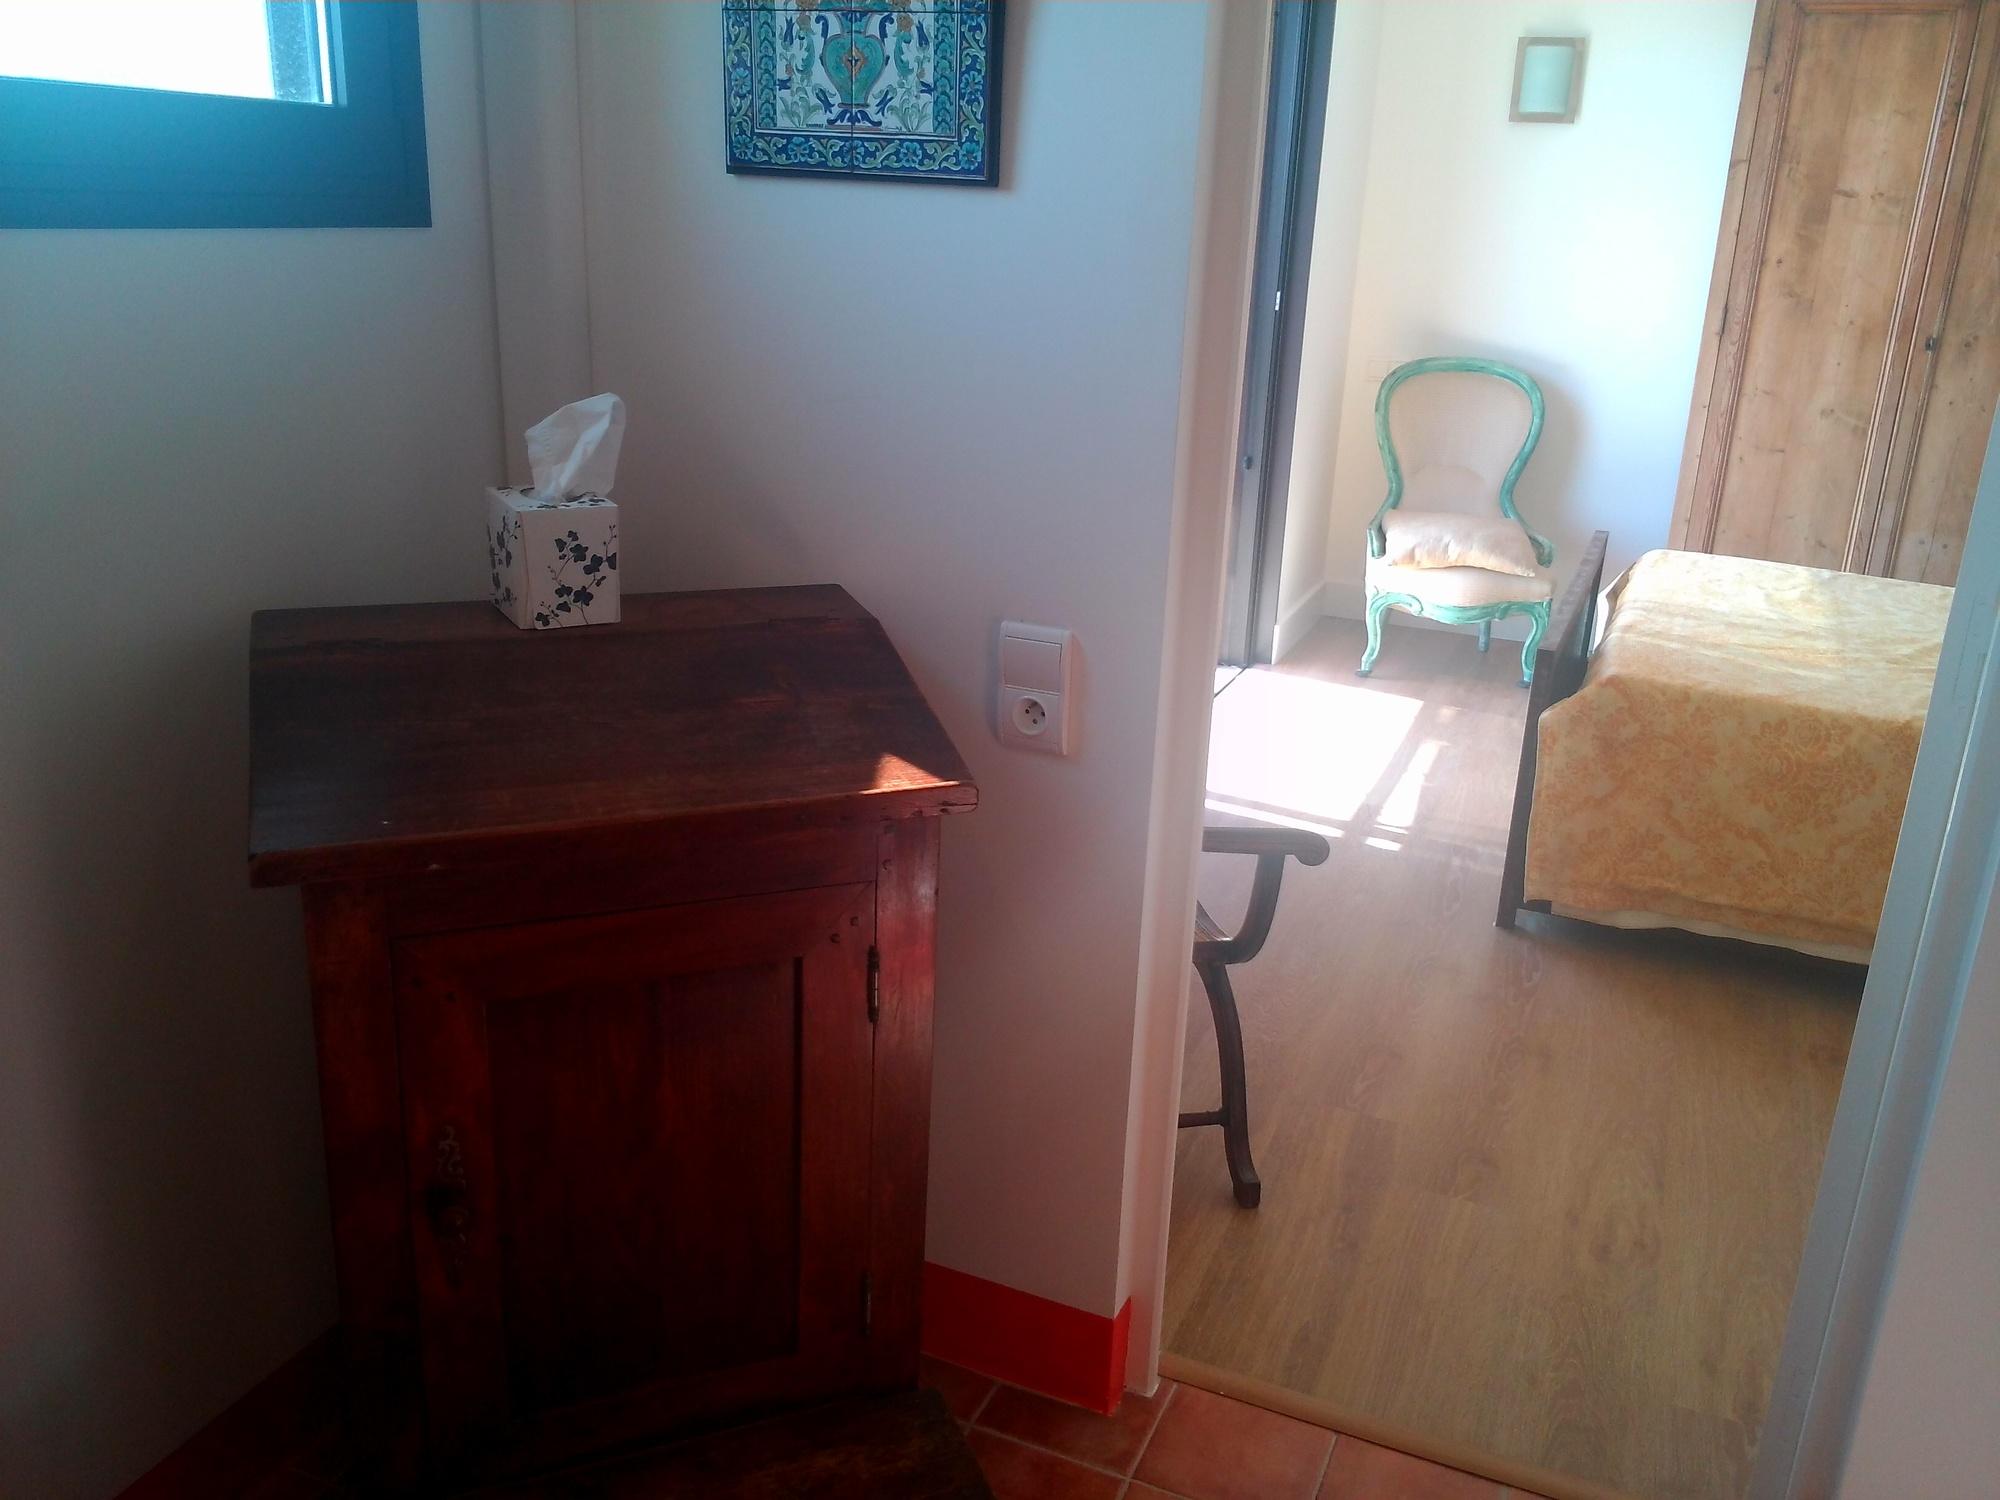 villa mirabel hy res chambre d 39 h tes office de tourisme d 39 hy res porquerolles port cros. Black Bedroom Furniture Sets. Home Design Ideas